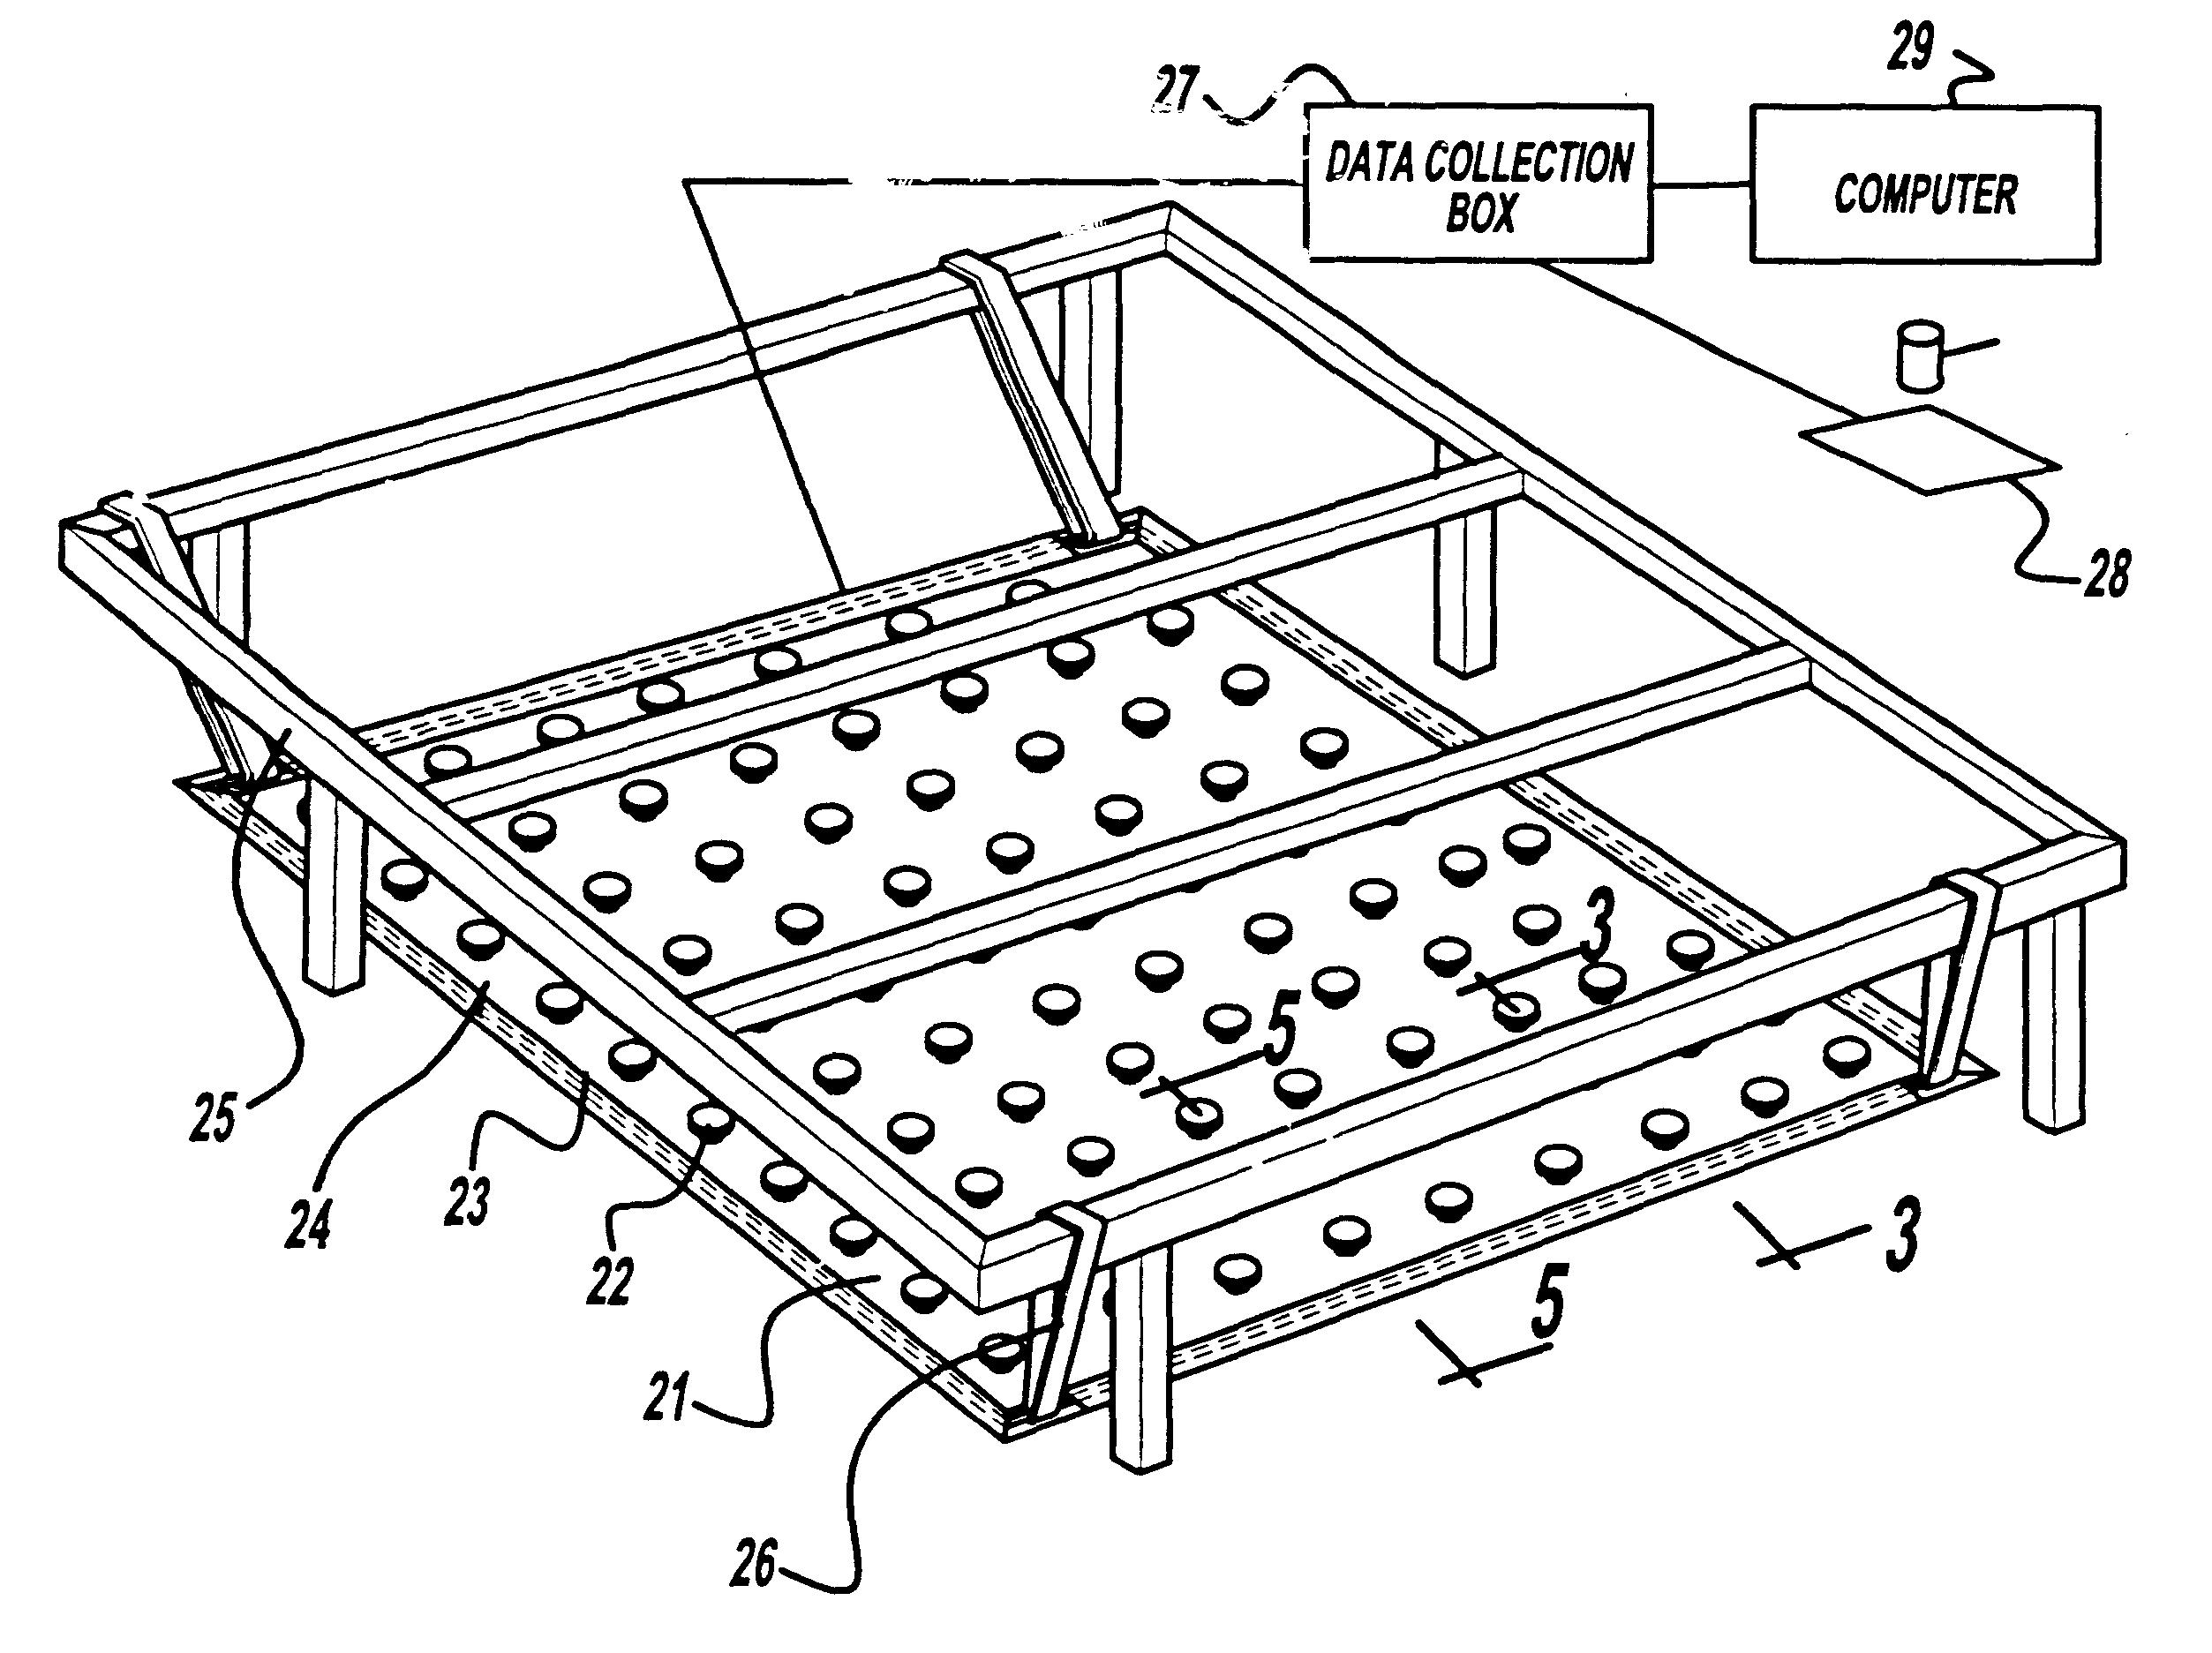 patent us6532190 - seismic sensor array